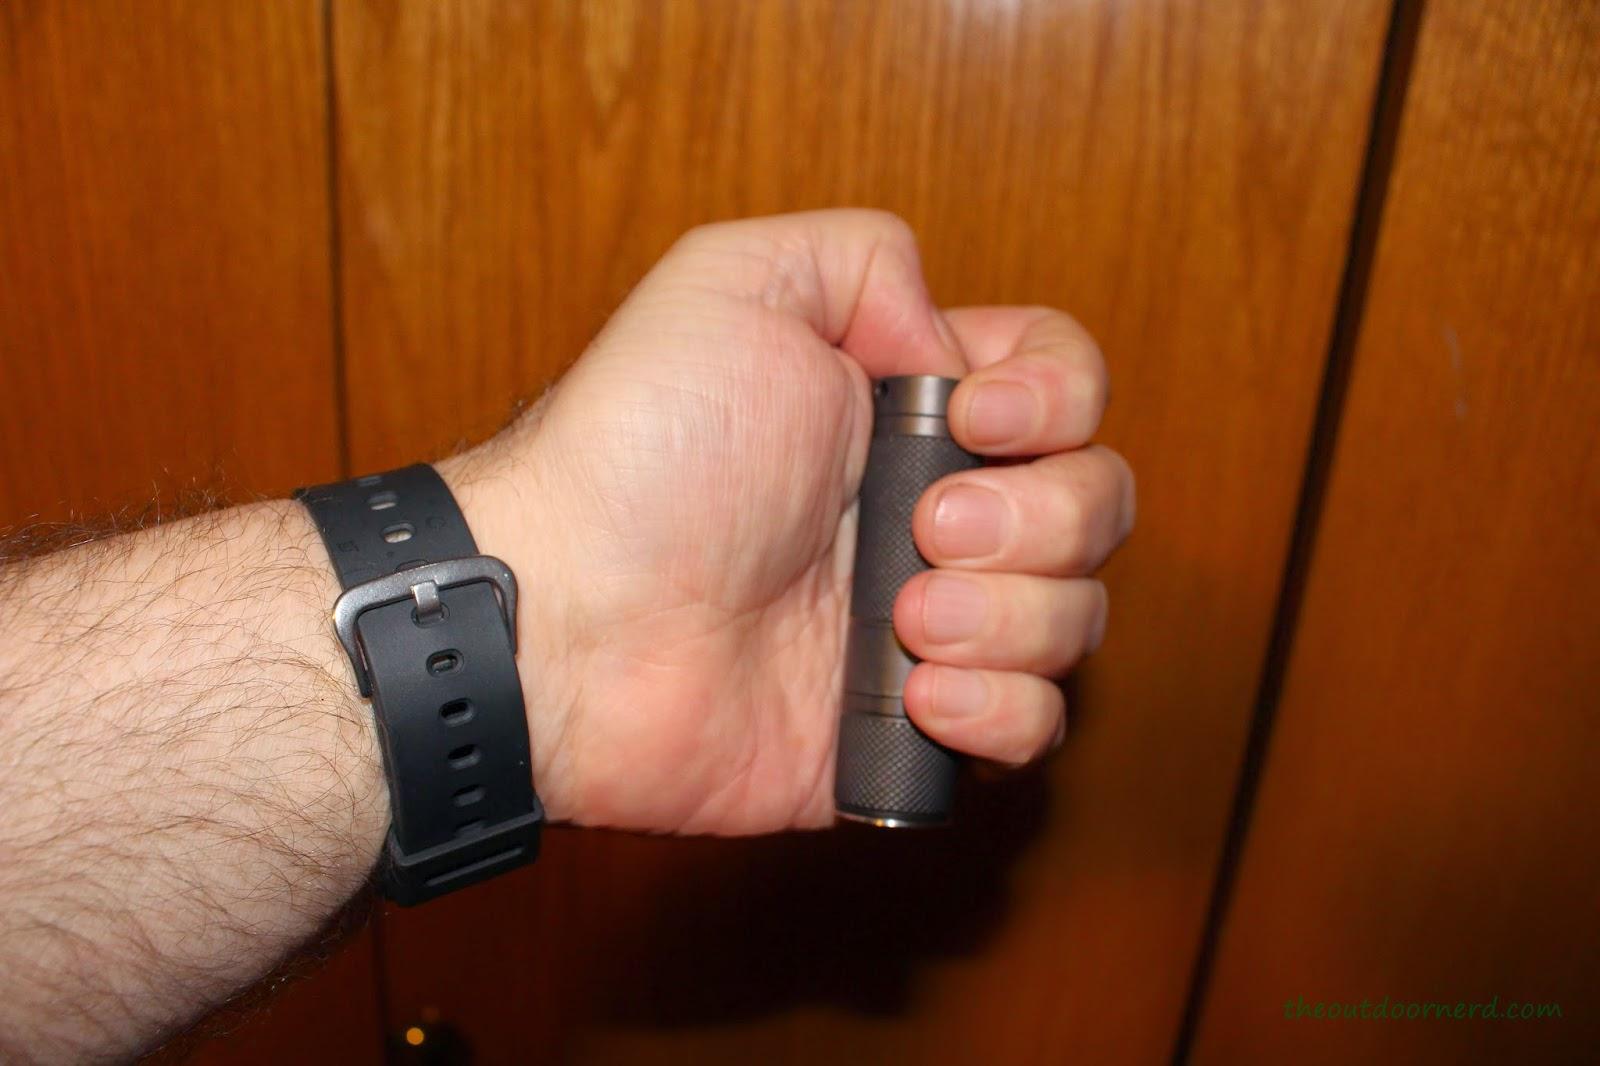 Nitecore Ex10 1xCR123A Flashlight In Hand 1